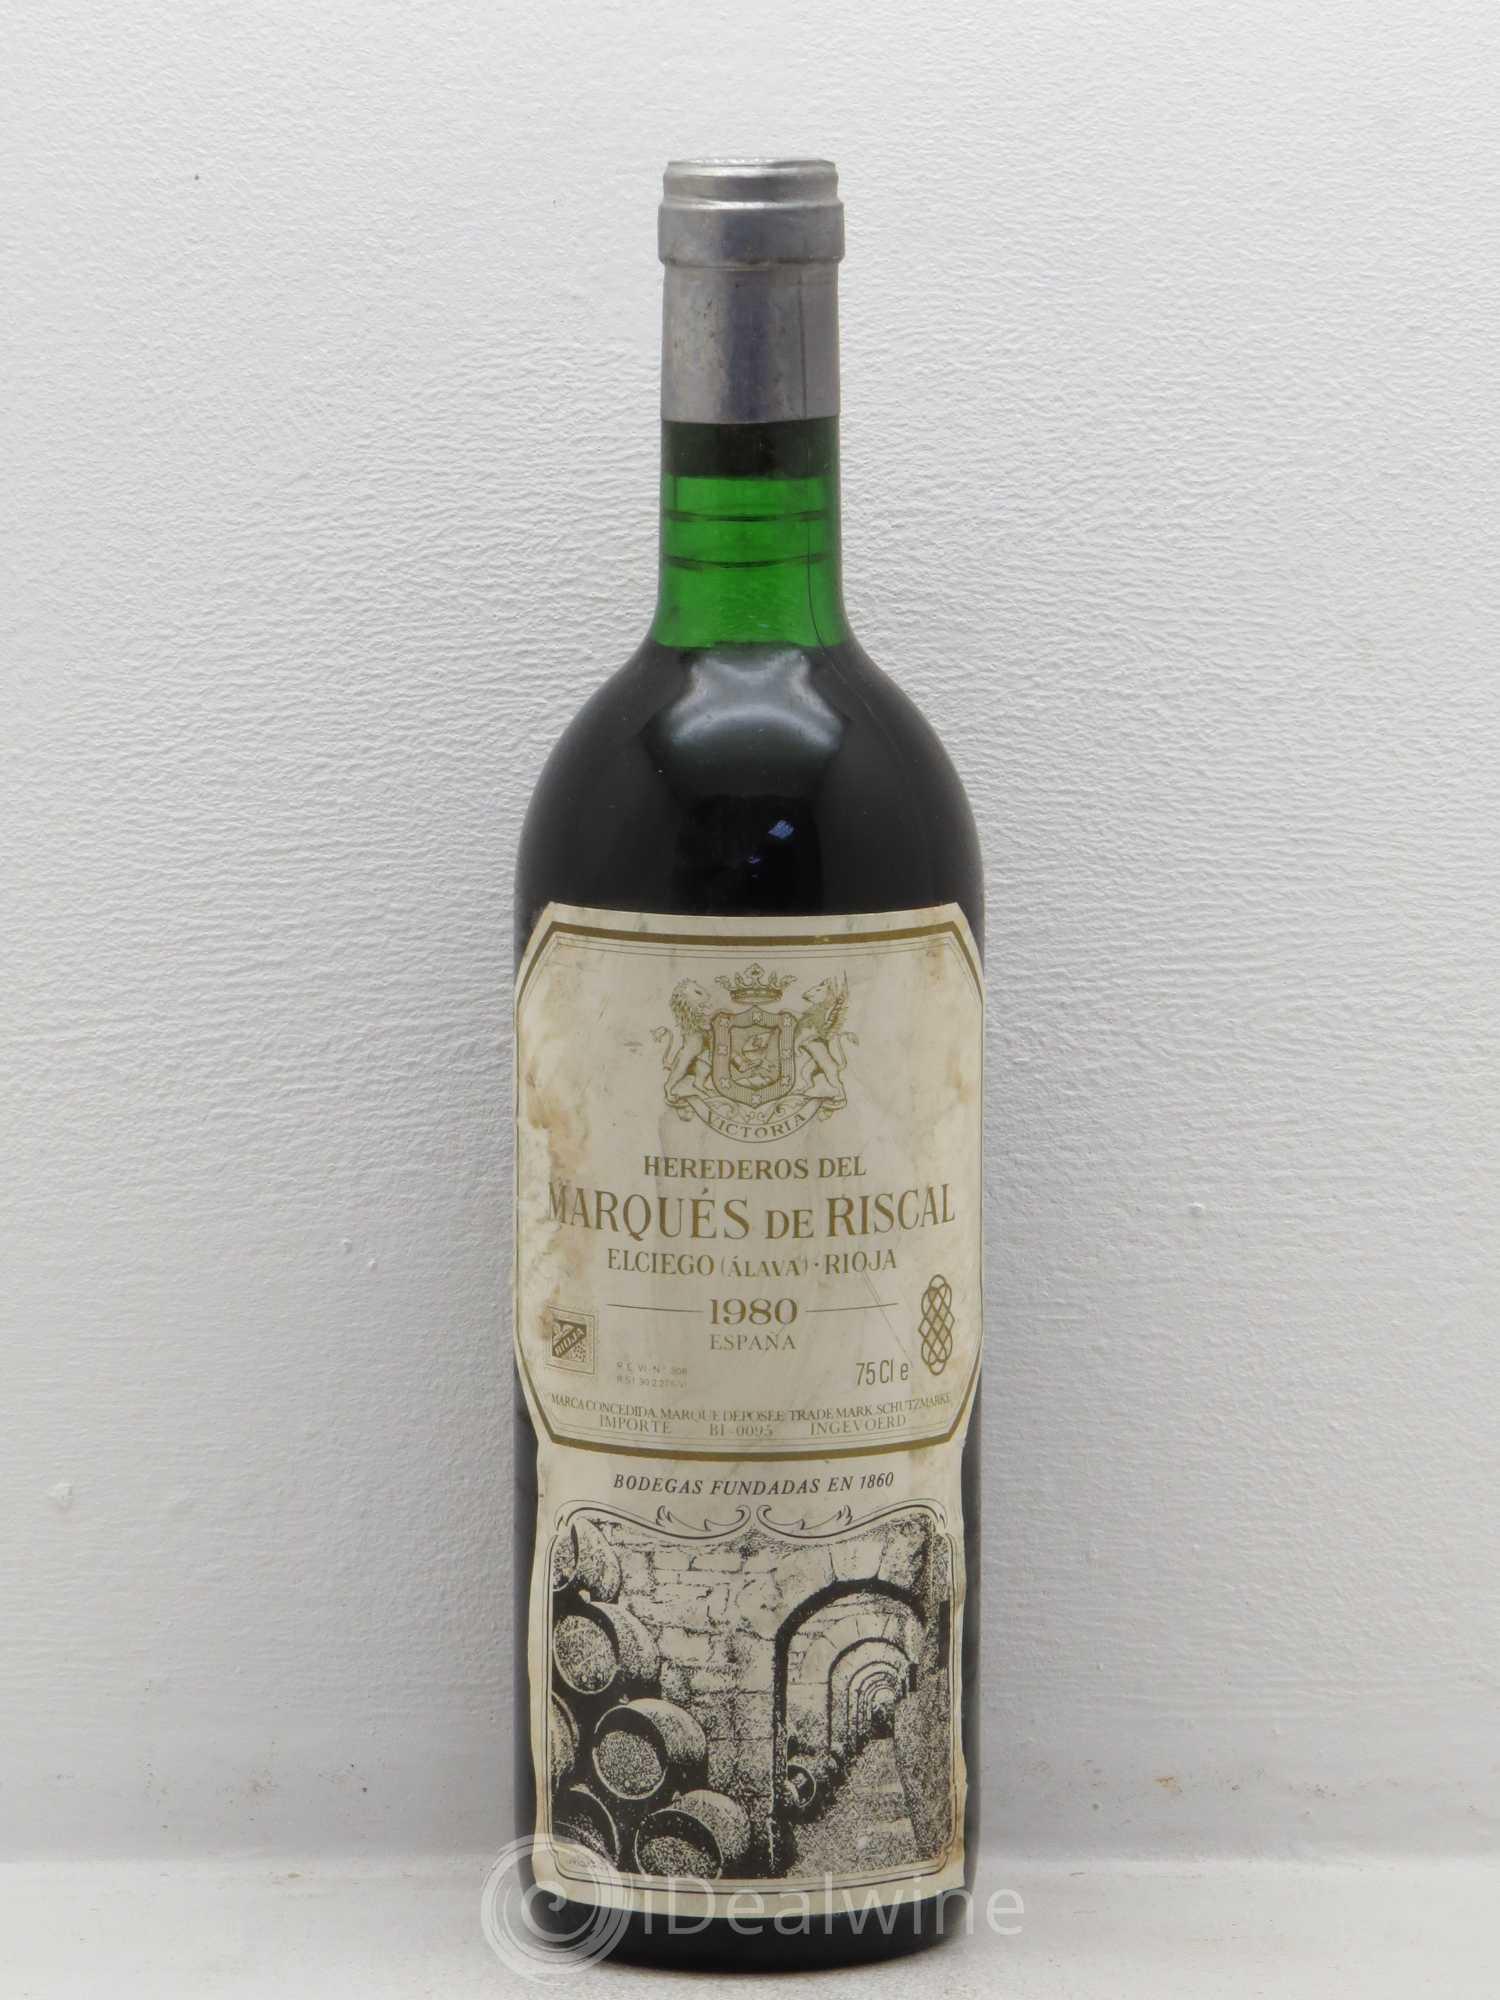 Buy rioja doca marques de riscal 1980 lot 6082 for Marques de riscal rioja